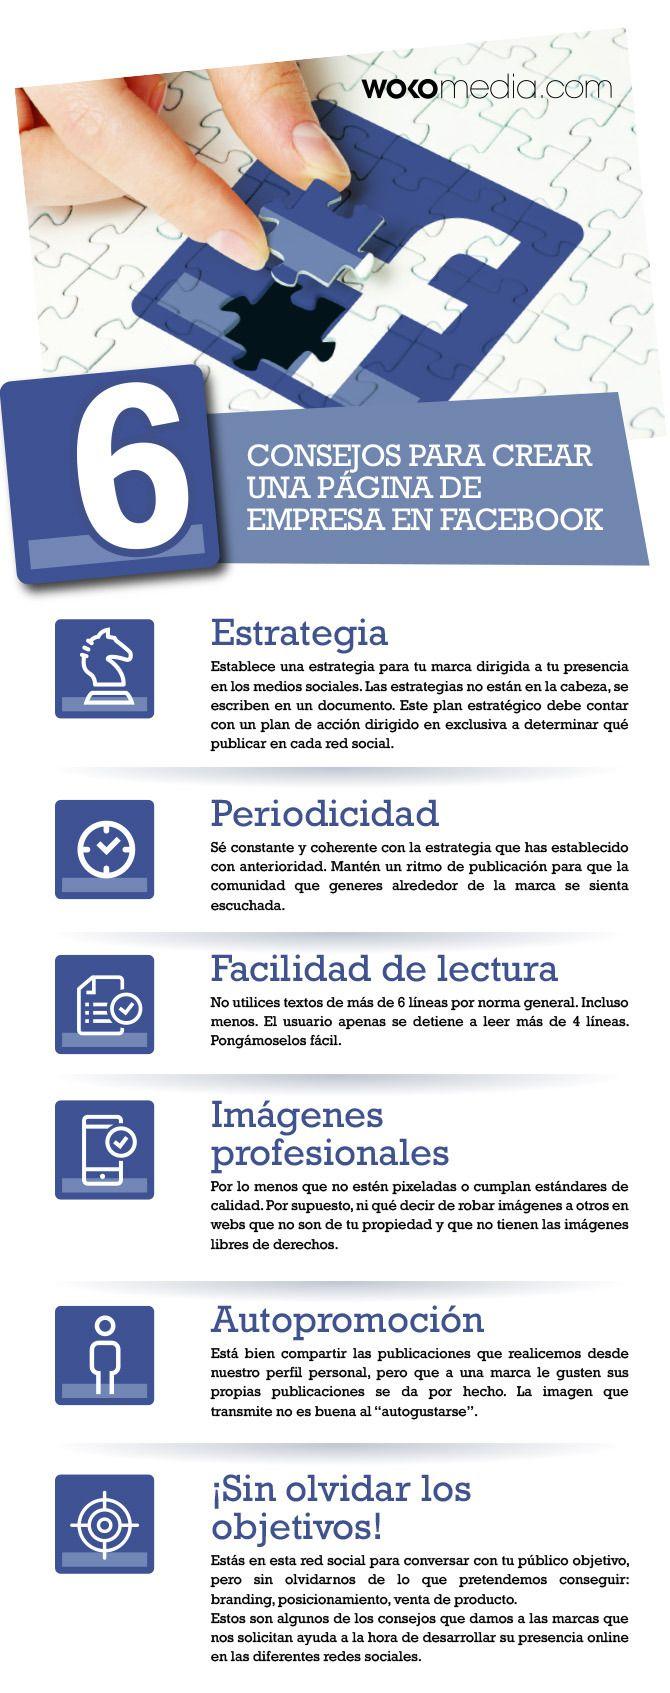 #Infografia #RedesSociales 6 consejos para crear la página de FaceBook de tu empresa. #TAVnews